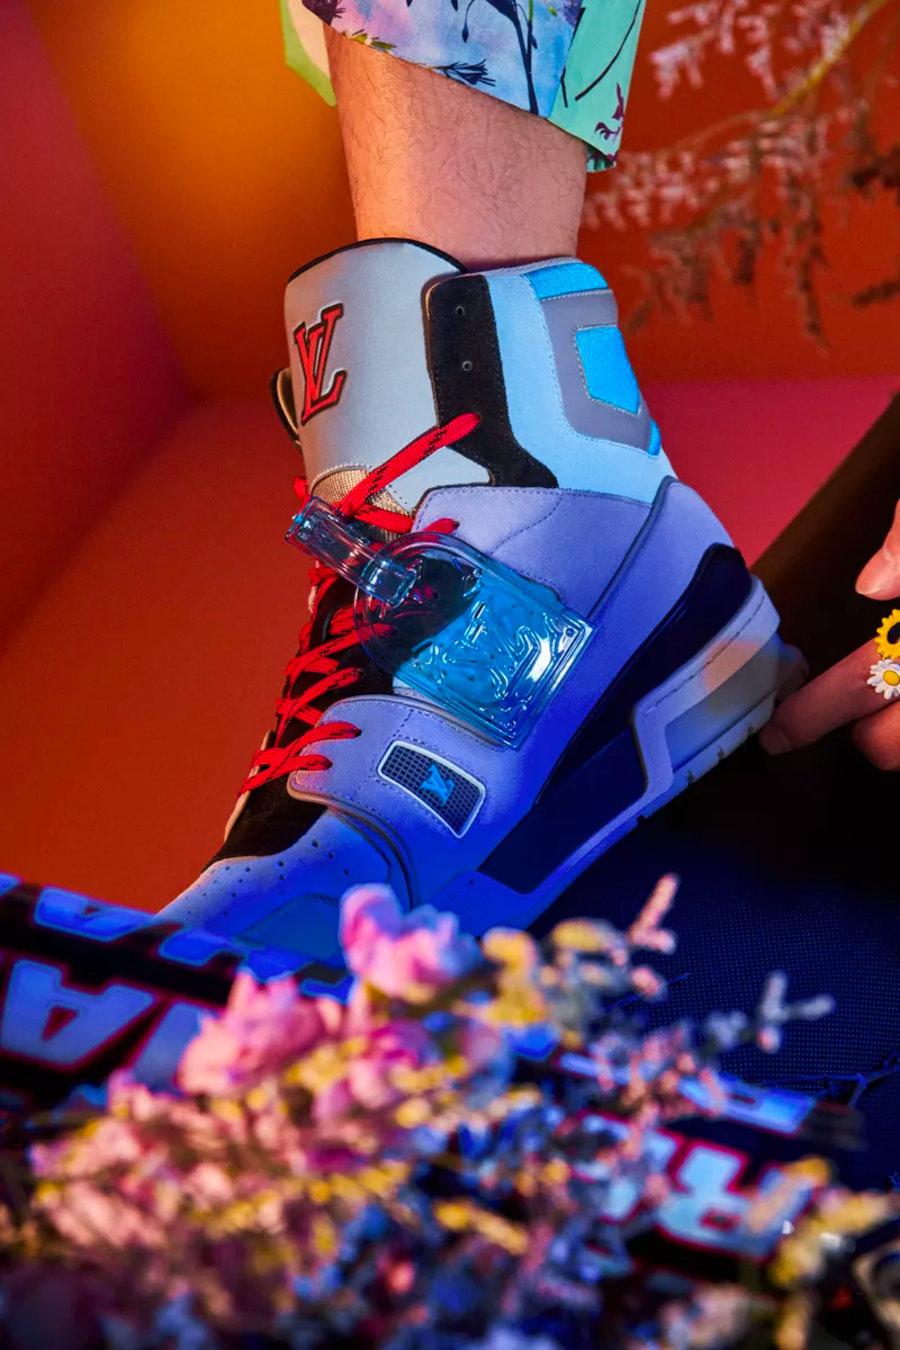 LV,Trainer,Louis Vuitton  LV 最难买的球鞋!七款全新配色曝光!还有湖人主题?!